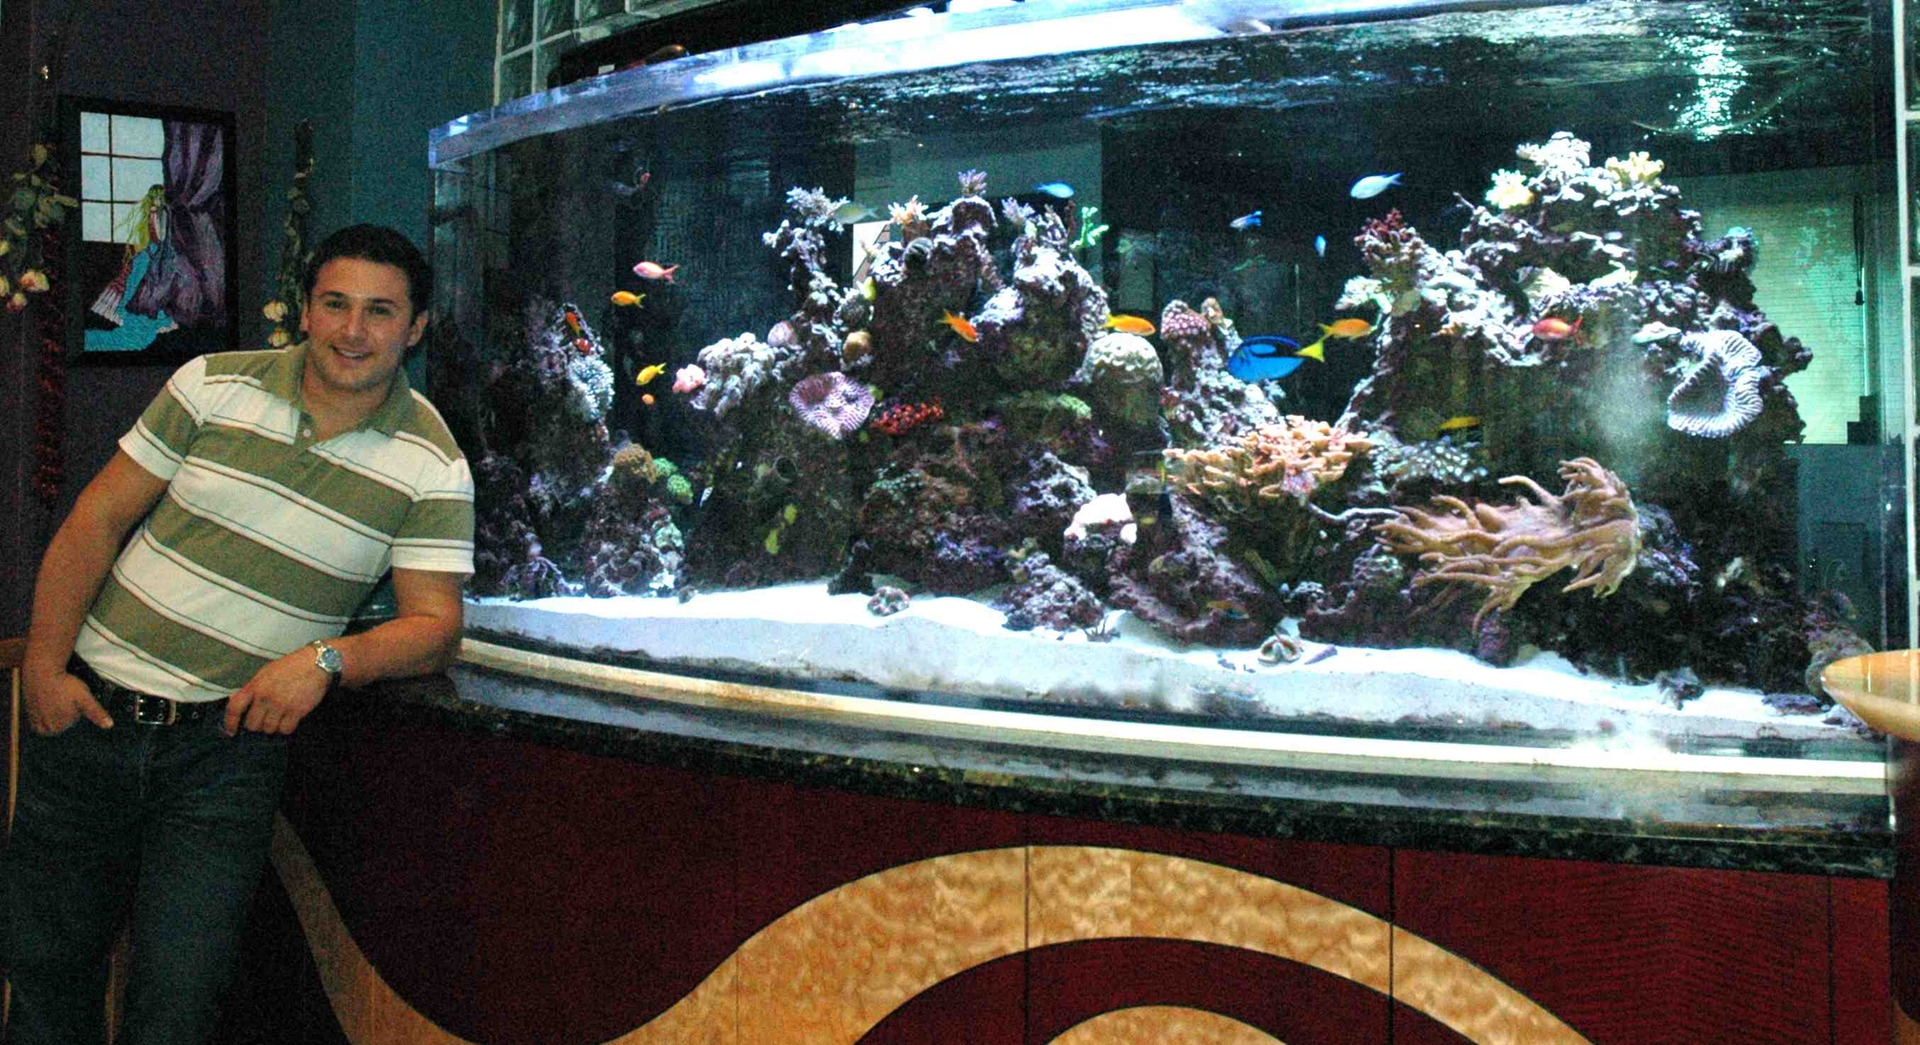 Freshwater aquarium fish maintenance - Limited Edition Corals Saltwater Aquarium Maintenance Saltwater Aquarium Fish Saltwater Aquarium Setup Other